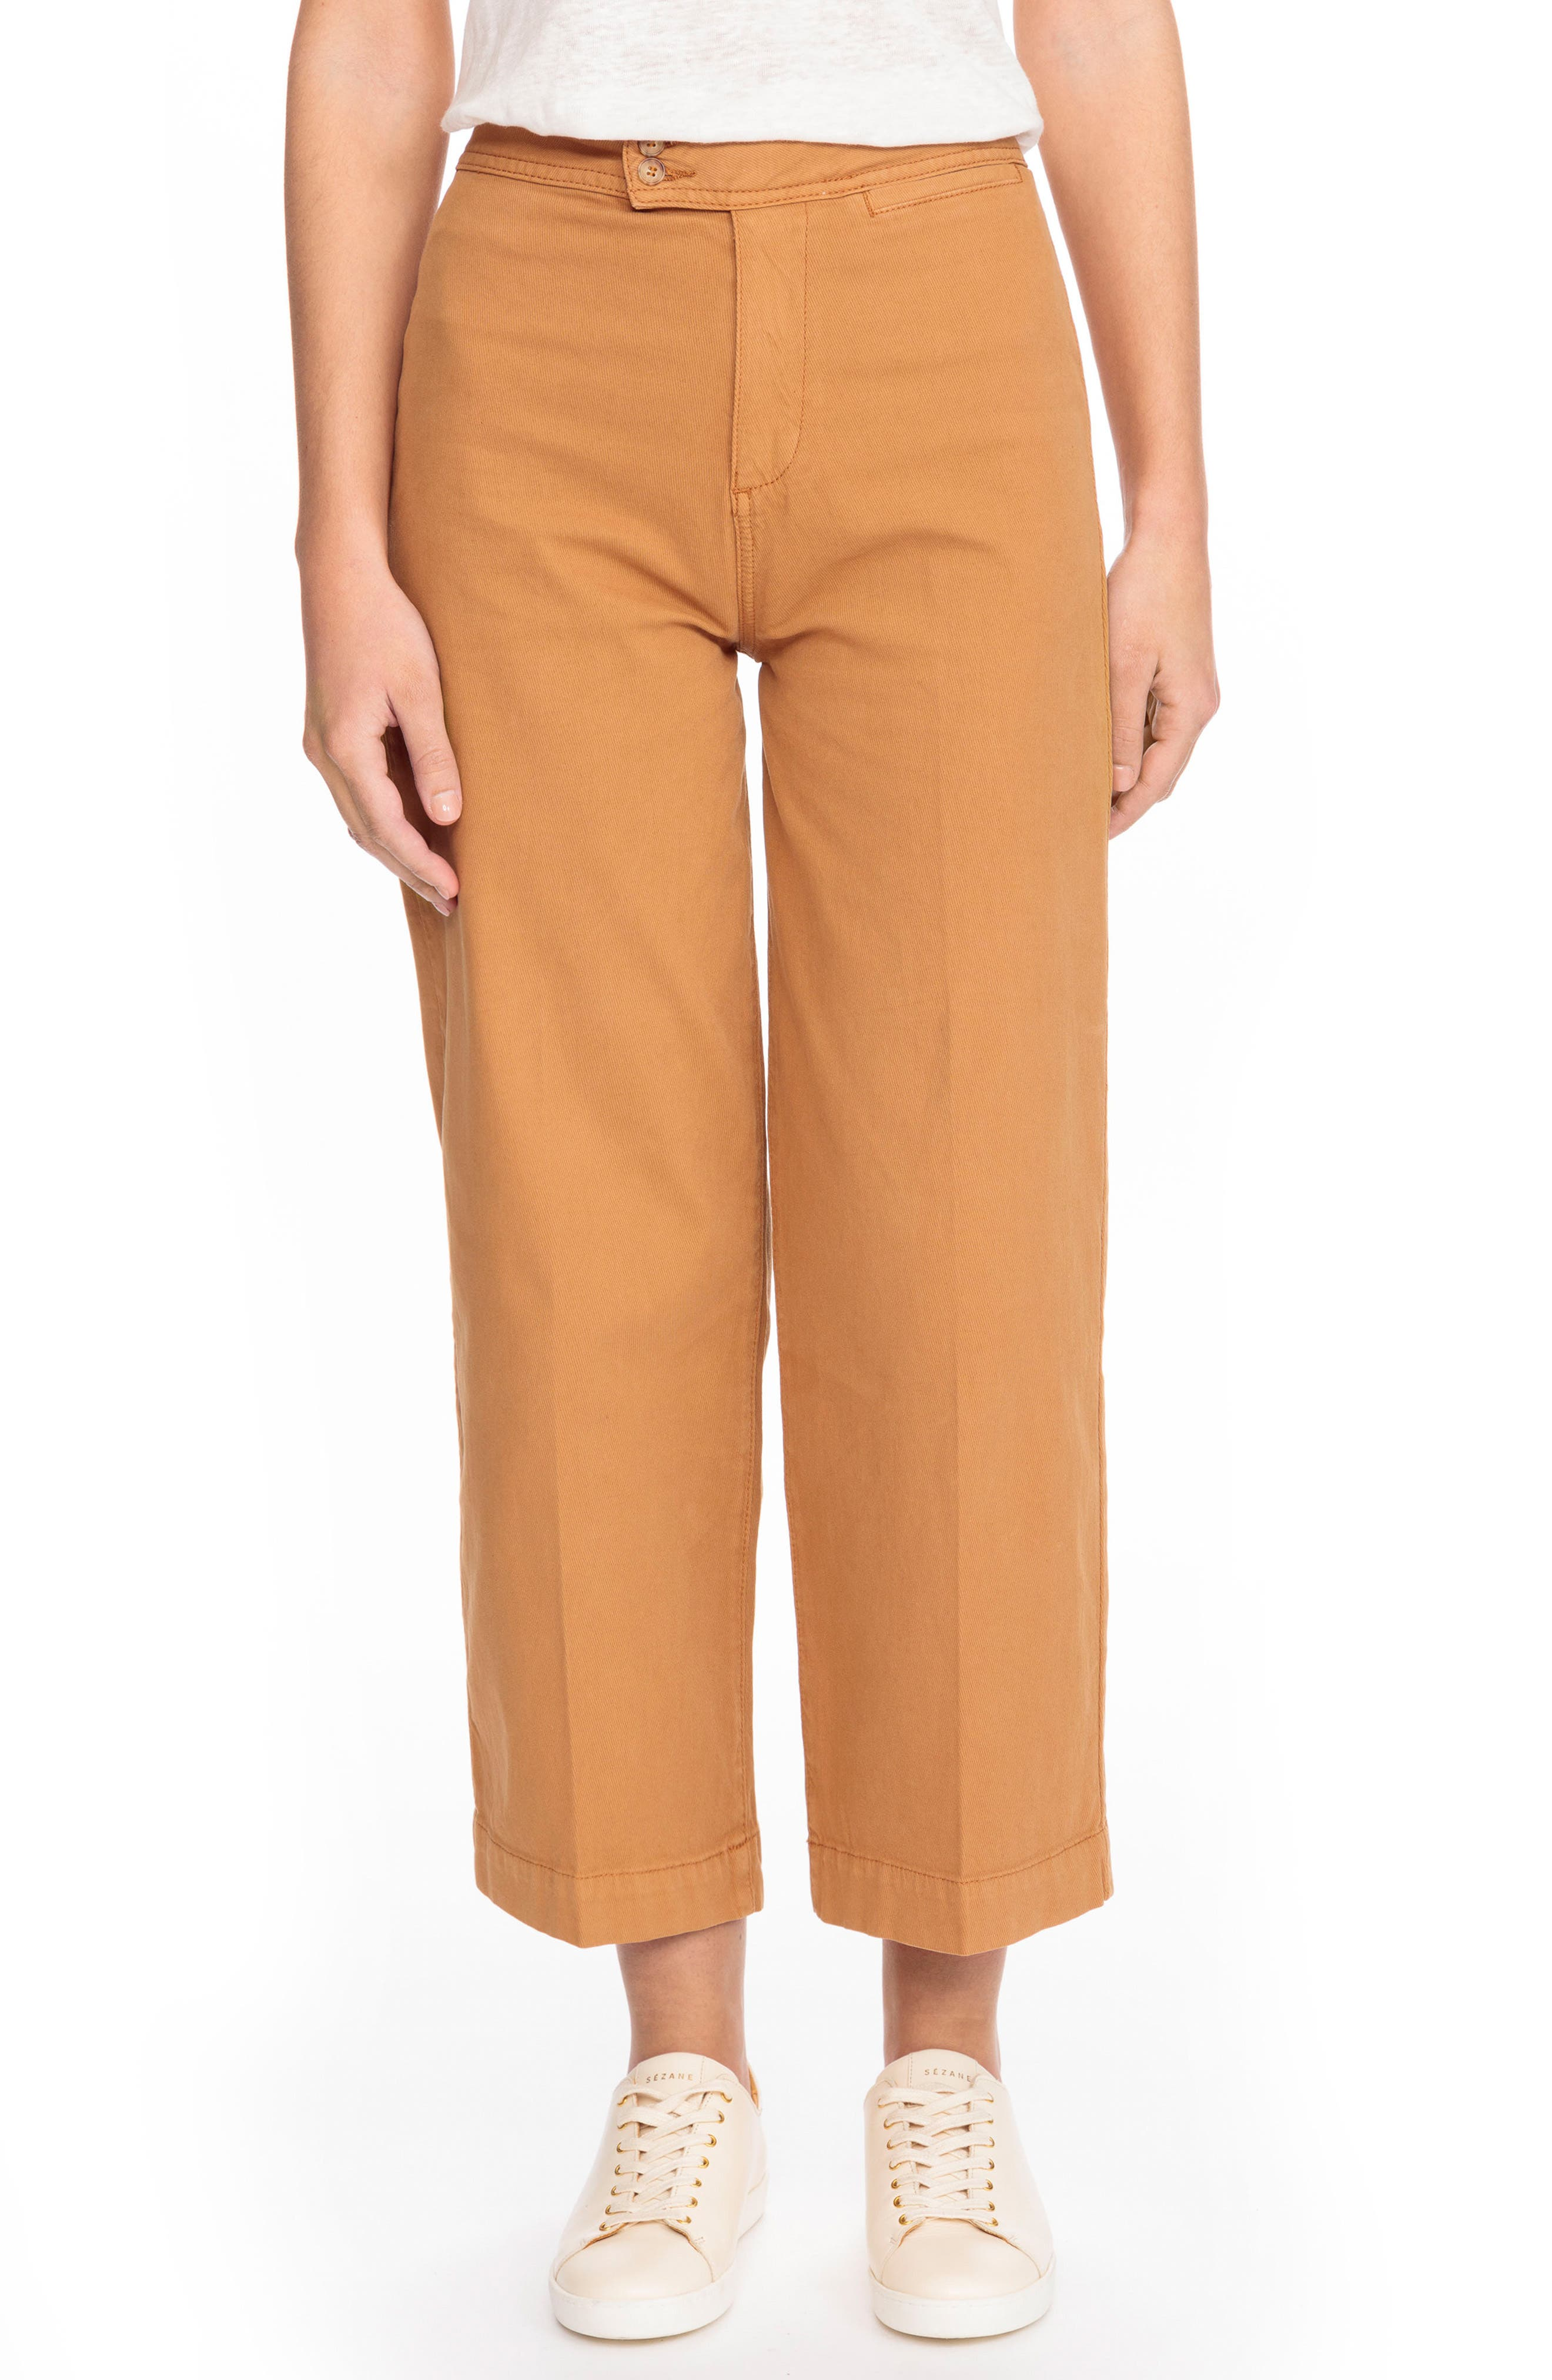 Sézane June Crop Pants